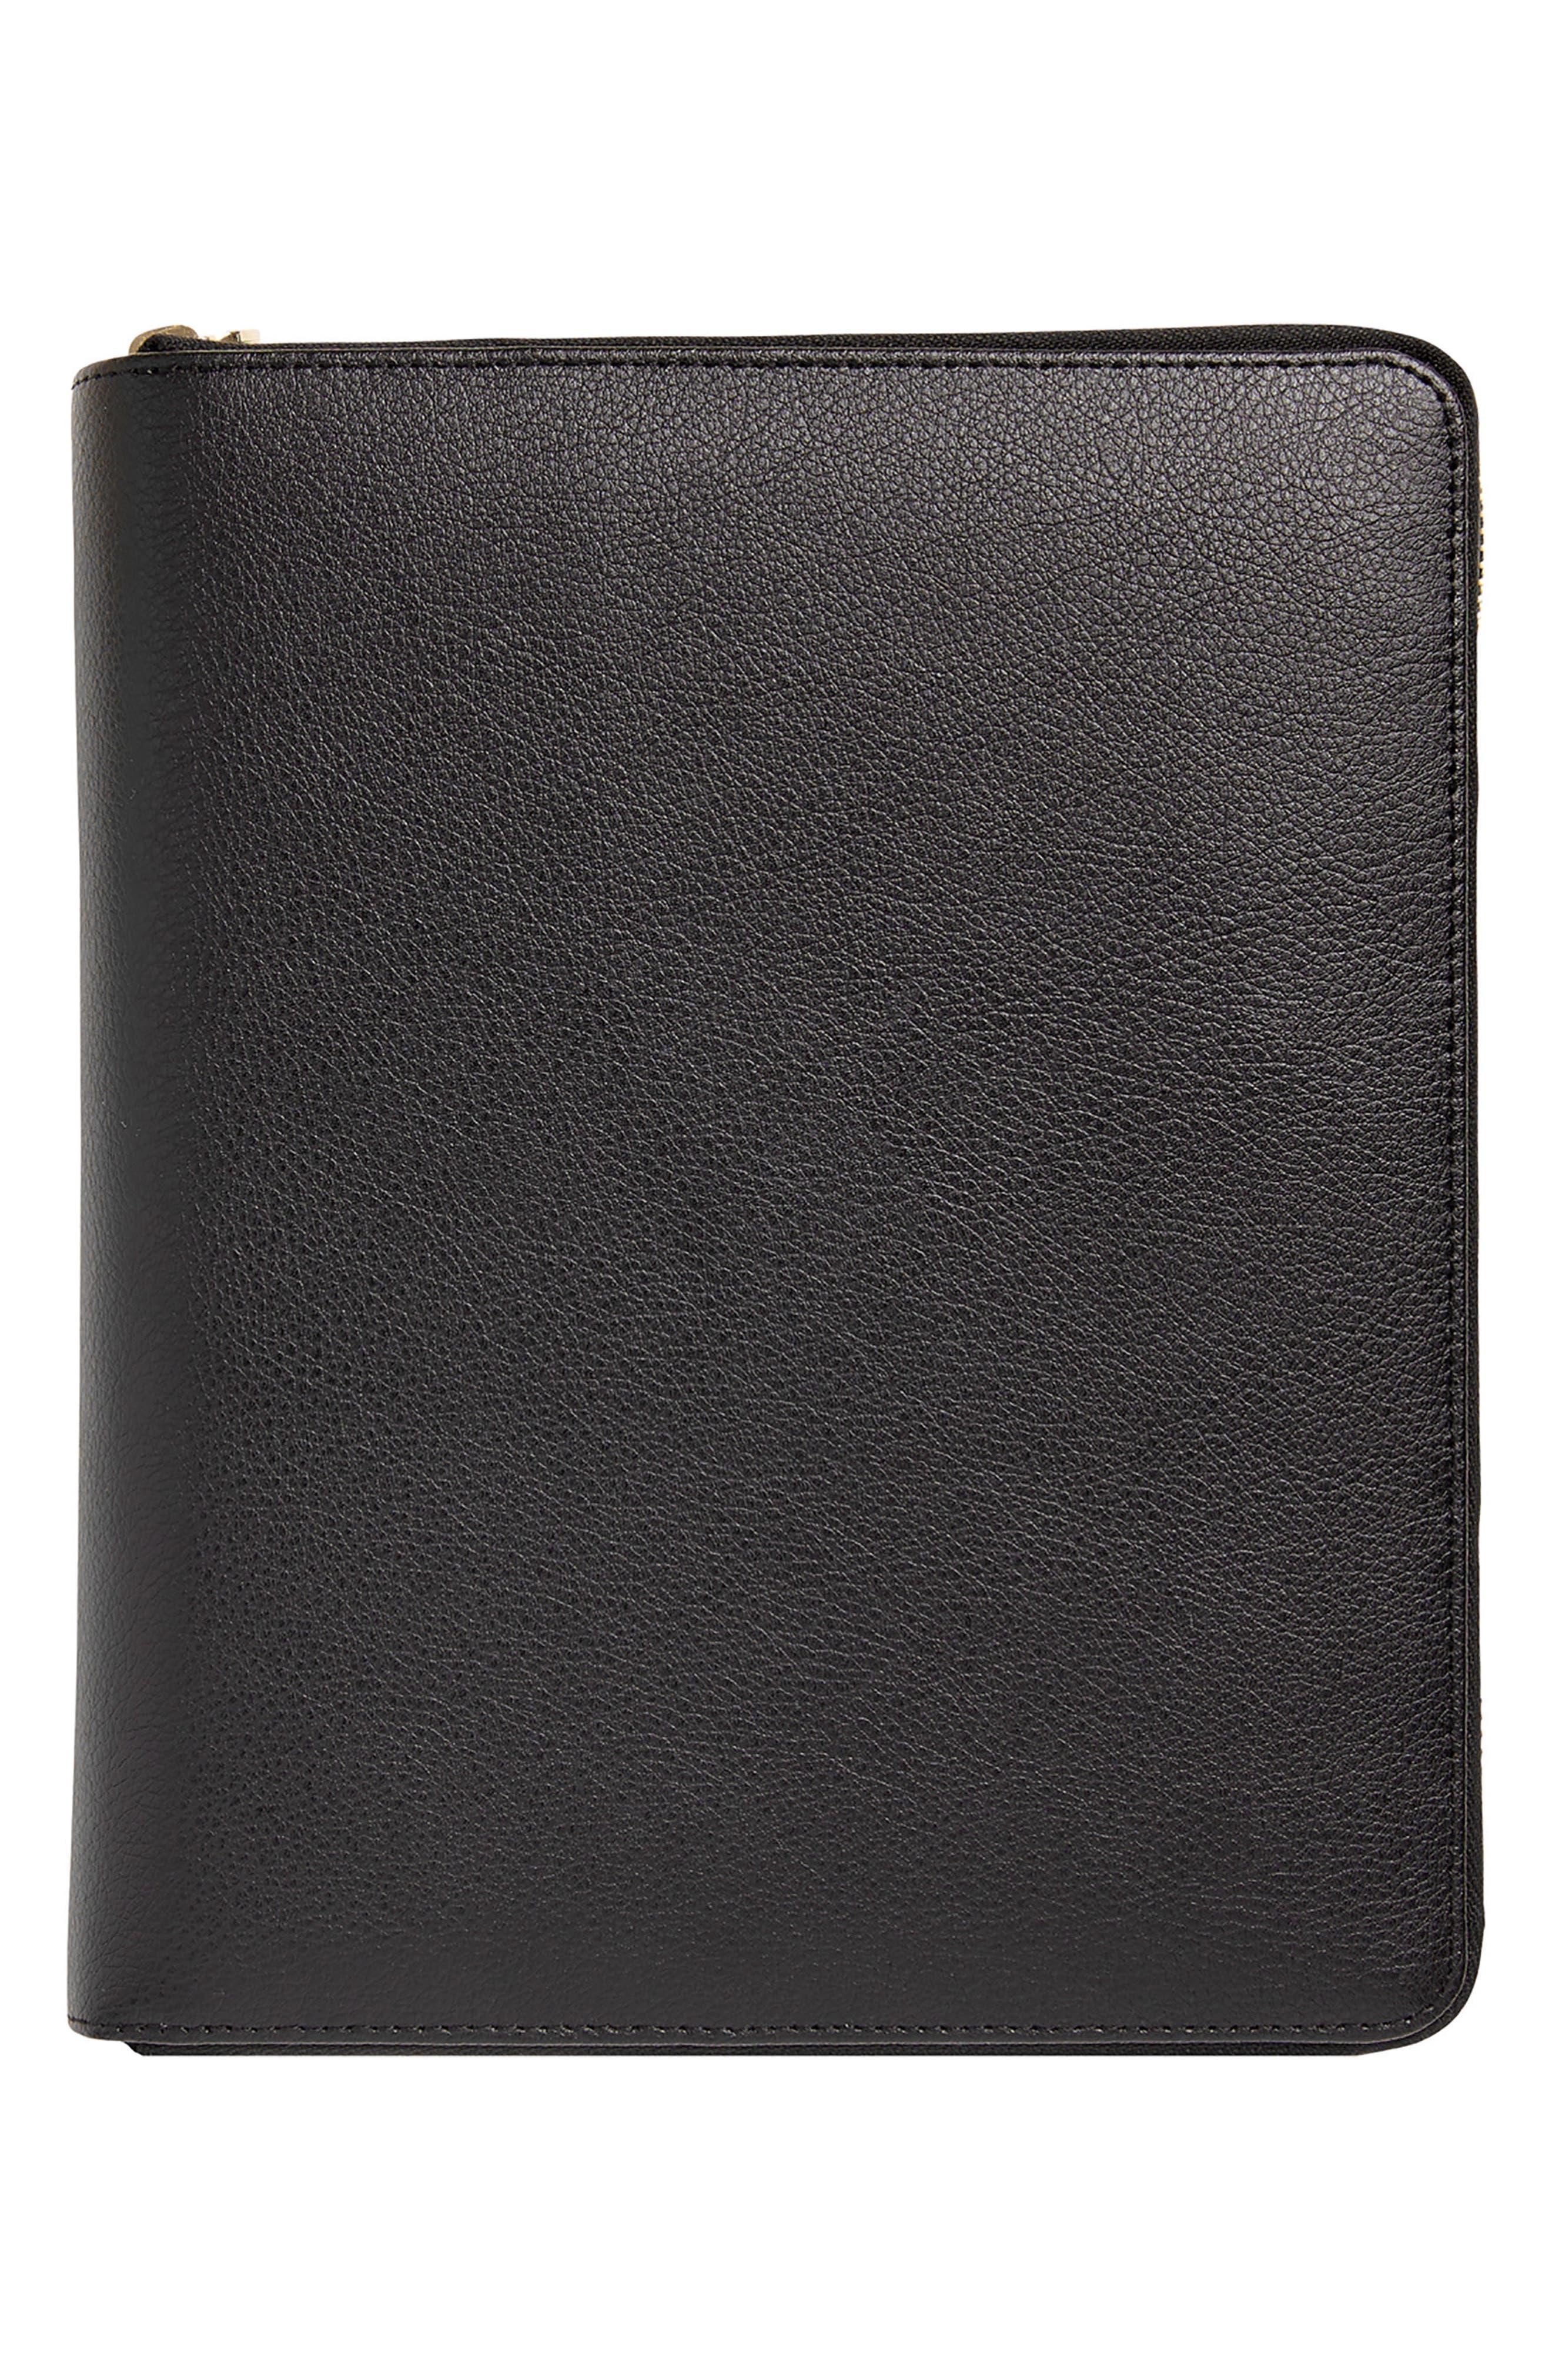 kikki.K Zip-Around Leather 18-Month Perpetual Planner